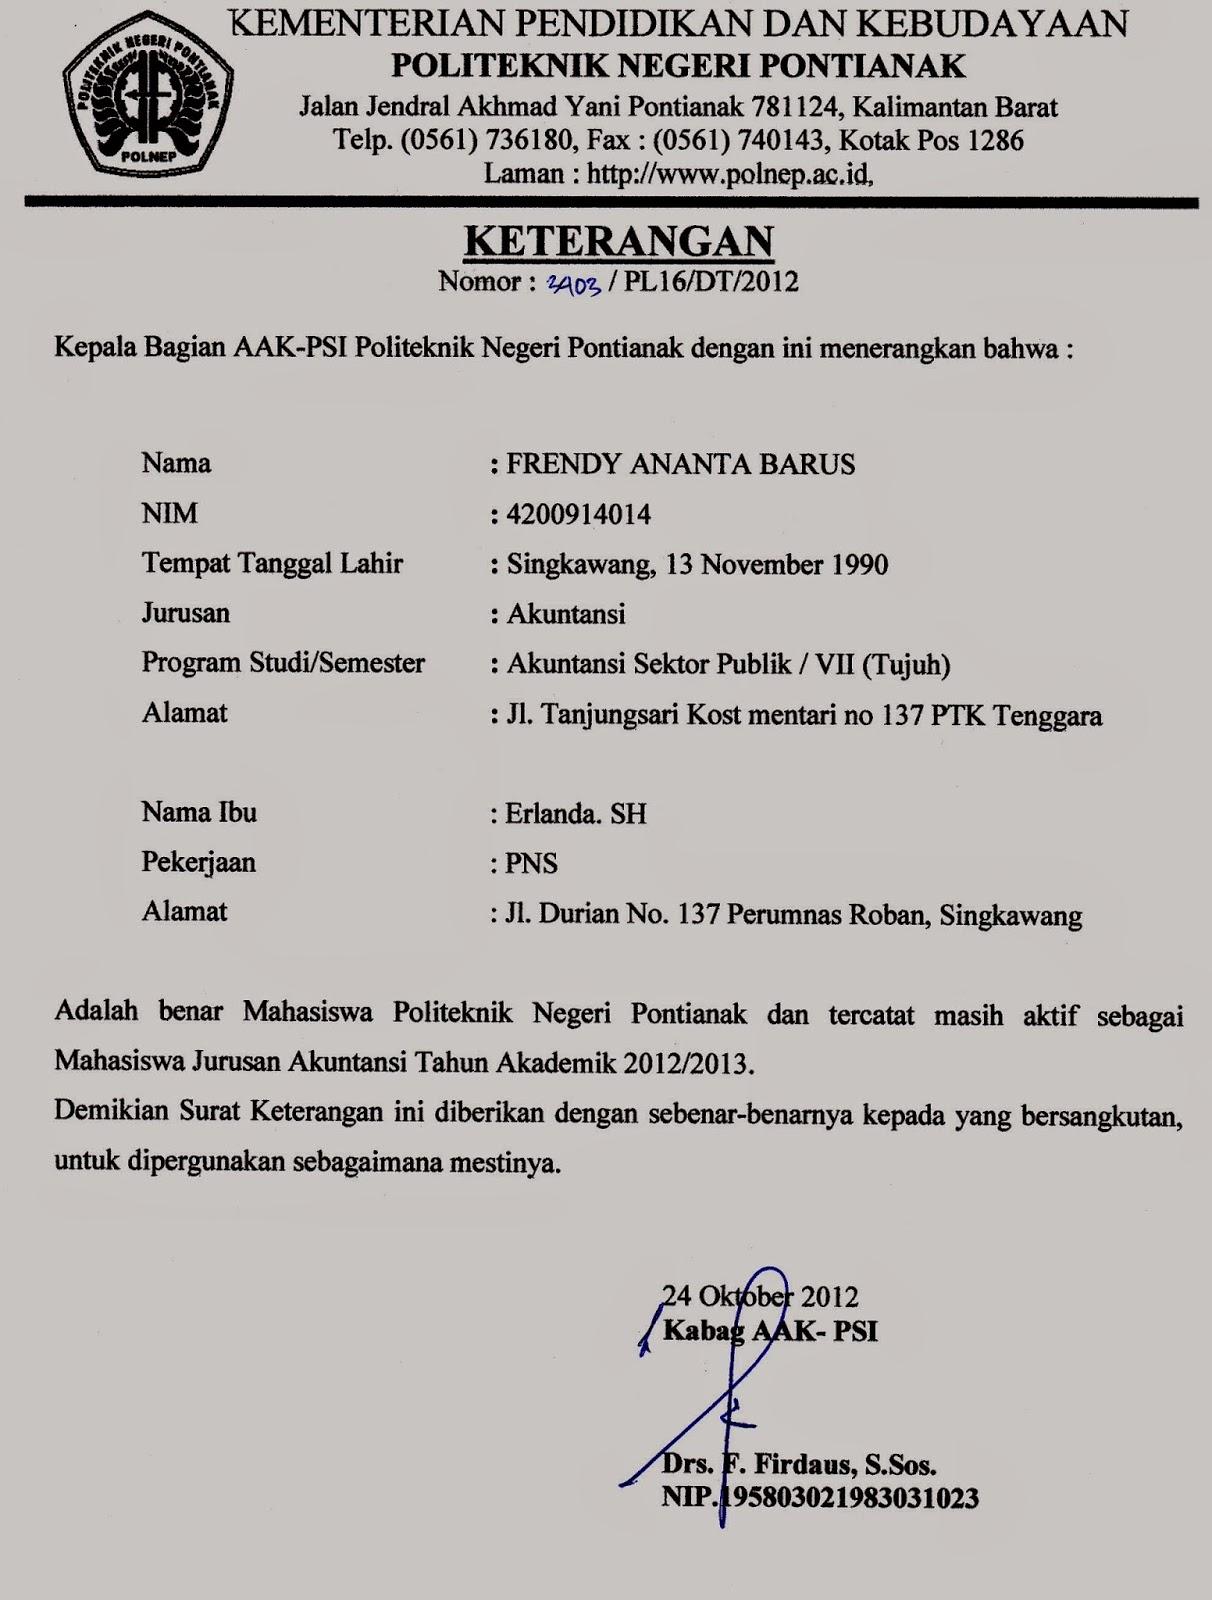 Surat Keterangan Aktif Kegiatan Organisasi April 2015